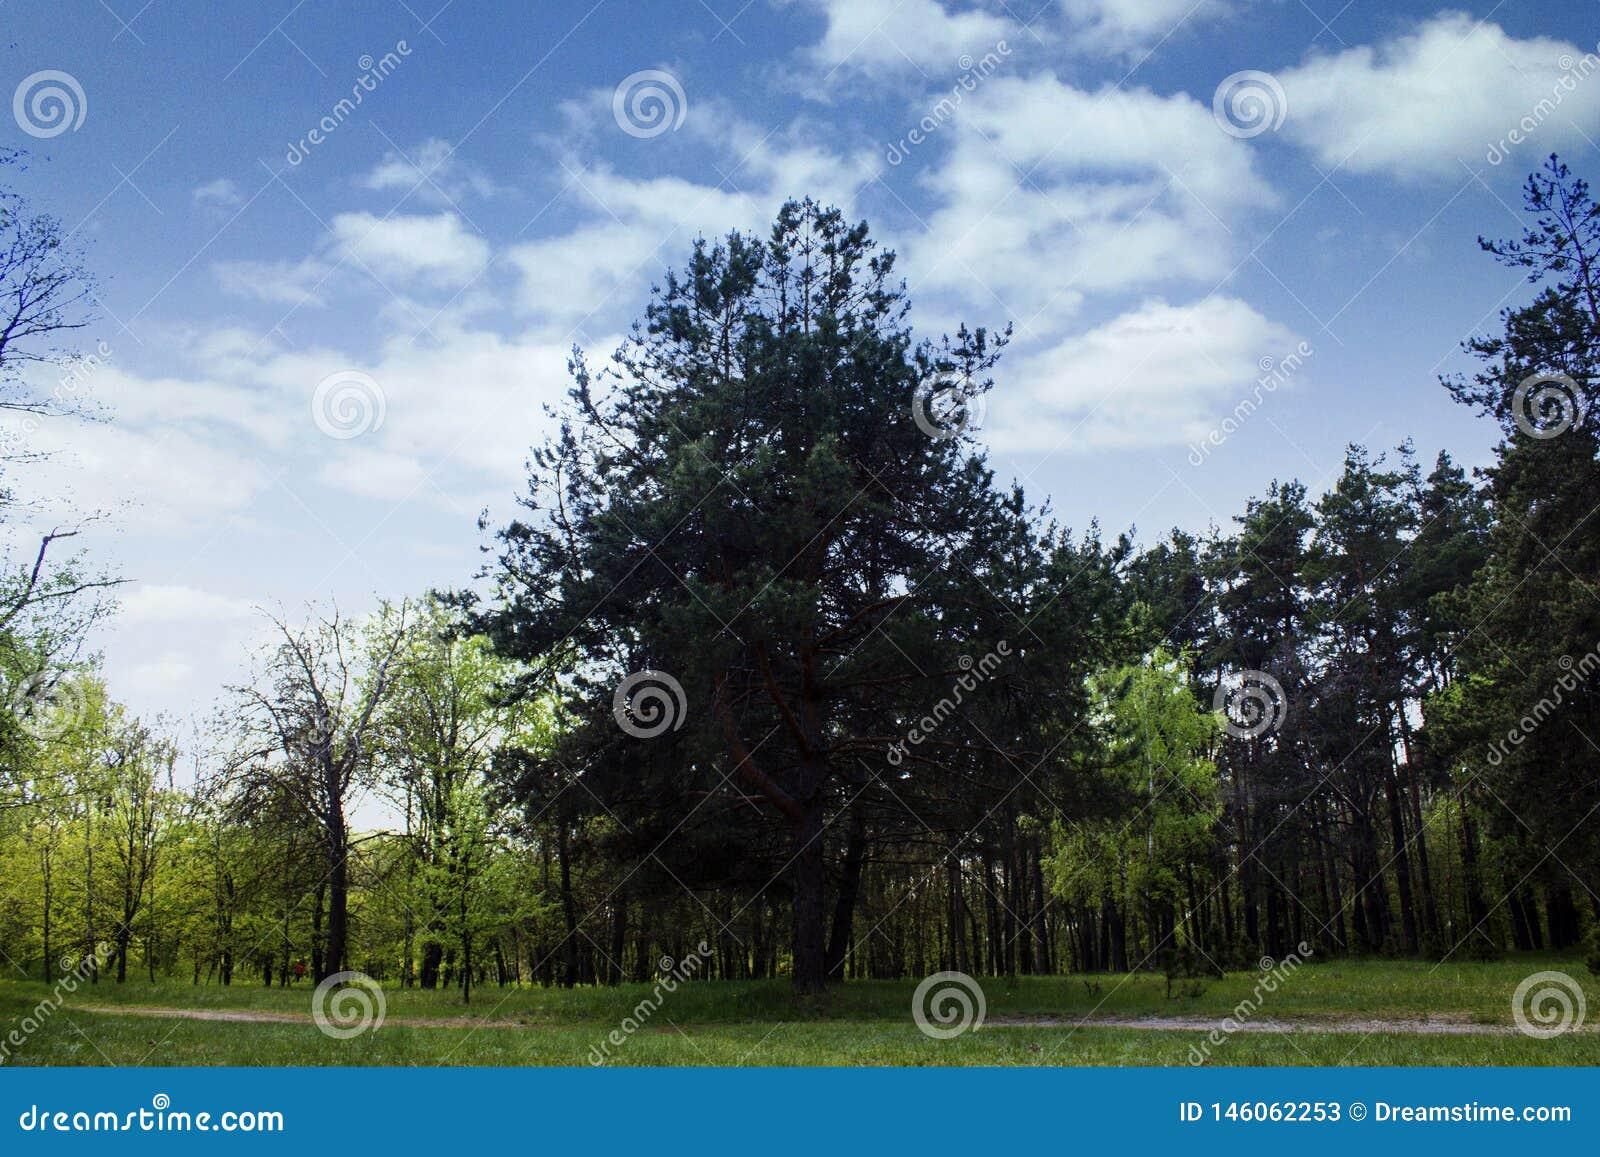 Деревья, природа, ландшафт, небо, облака